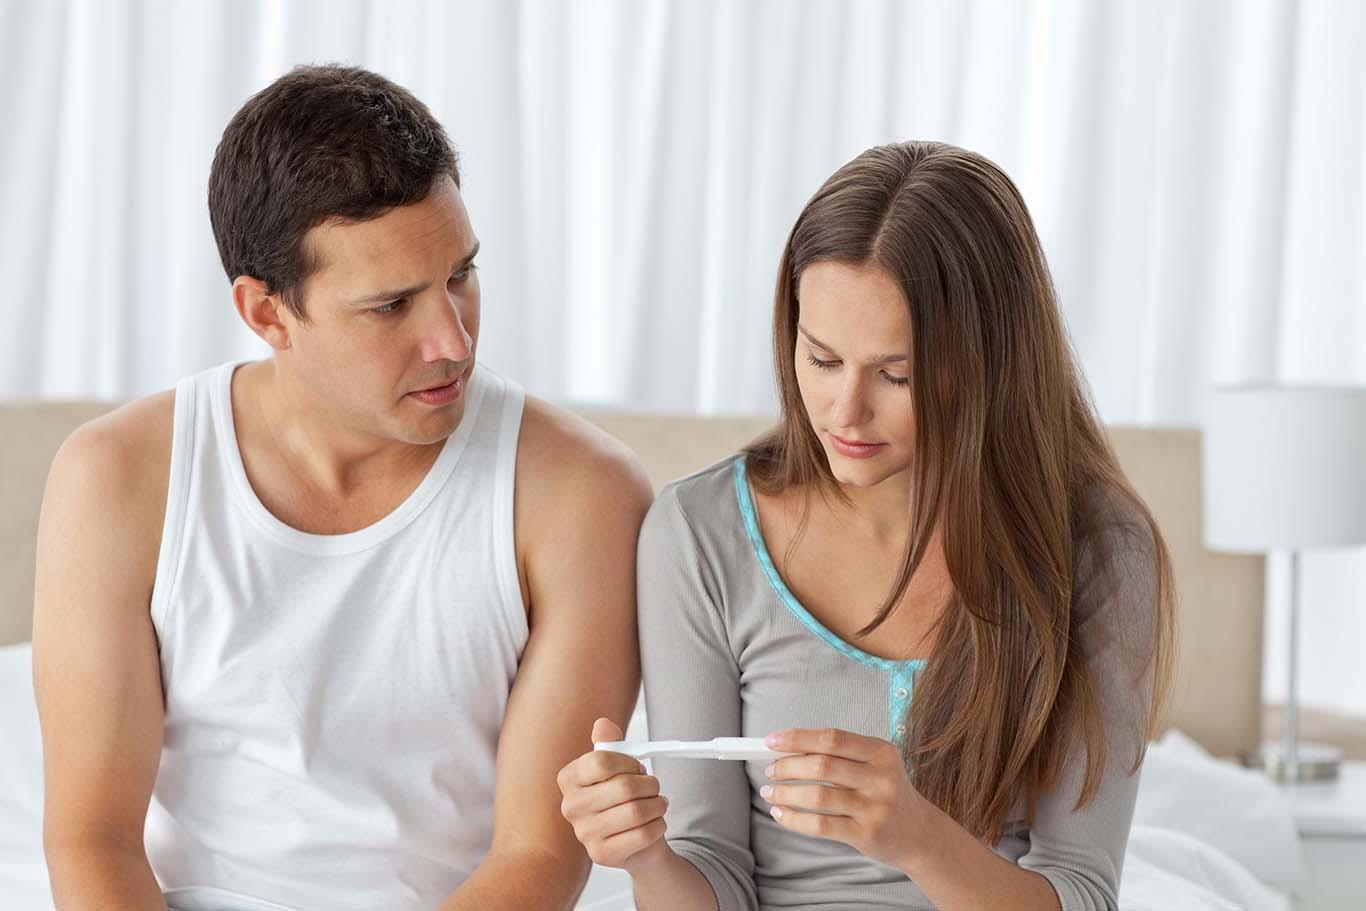 single far dating problemer La Singles matchmaking vurderinger